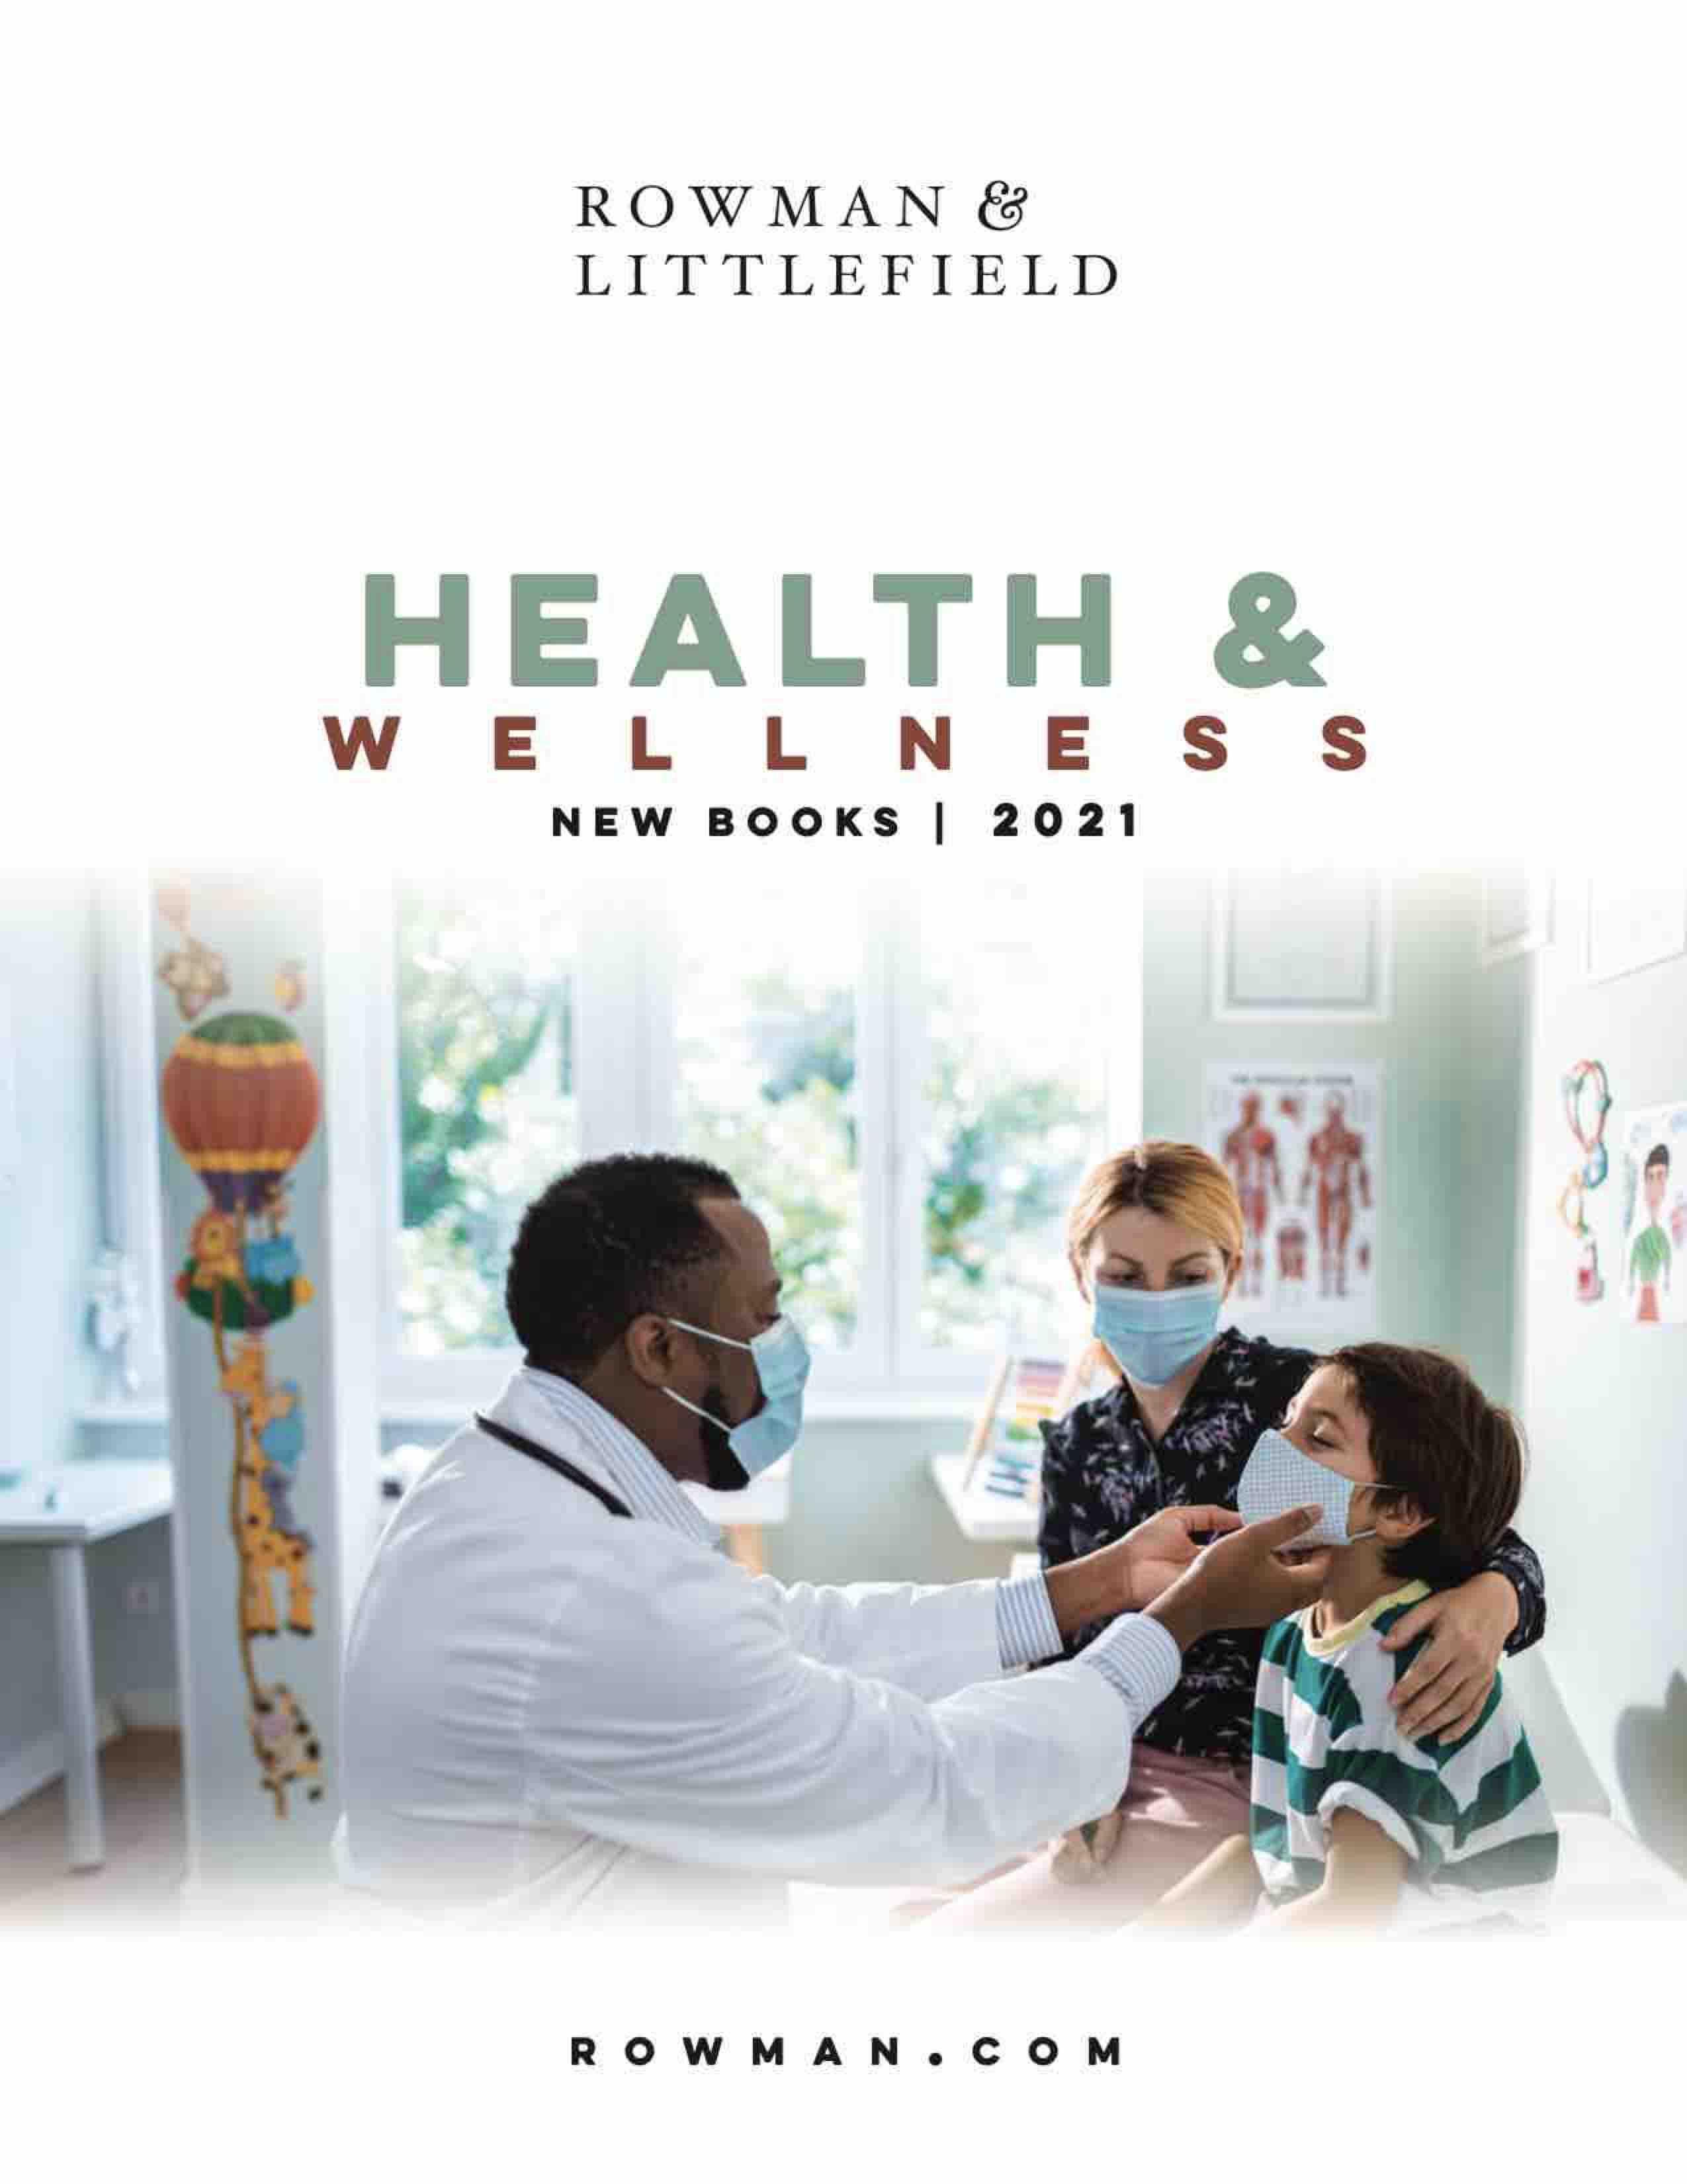 Cover image of the catalog titled 21RLSpringHealth&WellnessCatalog